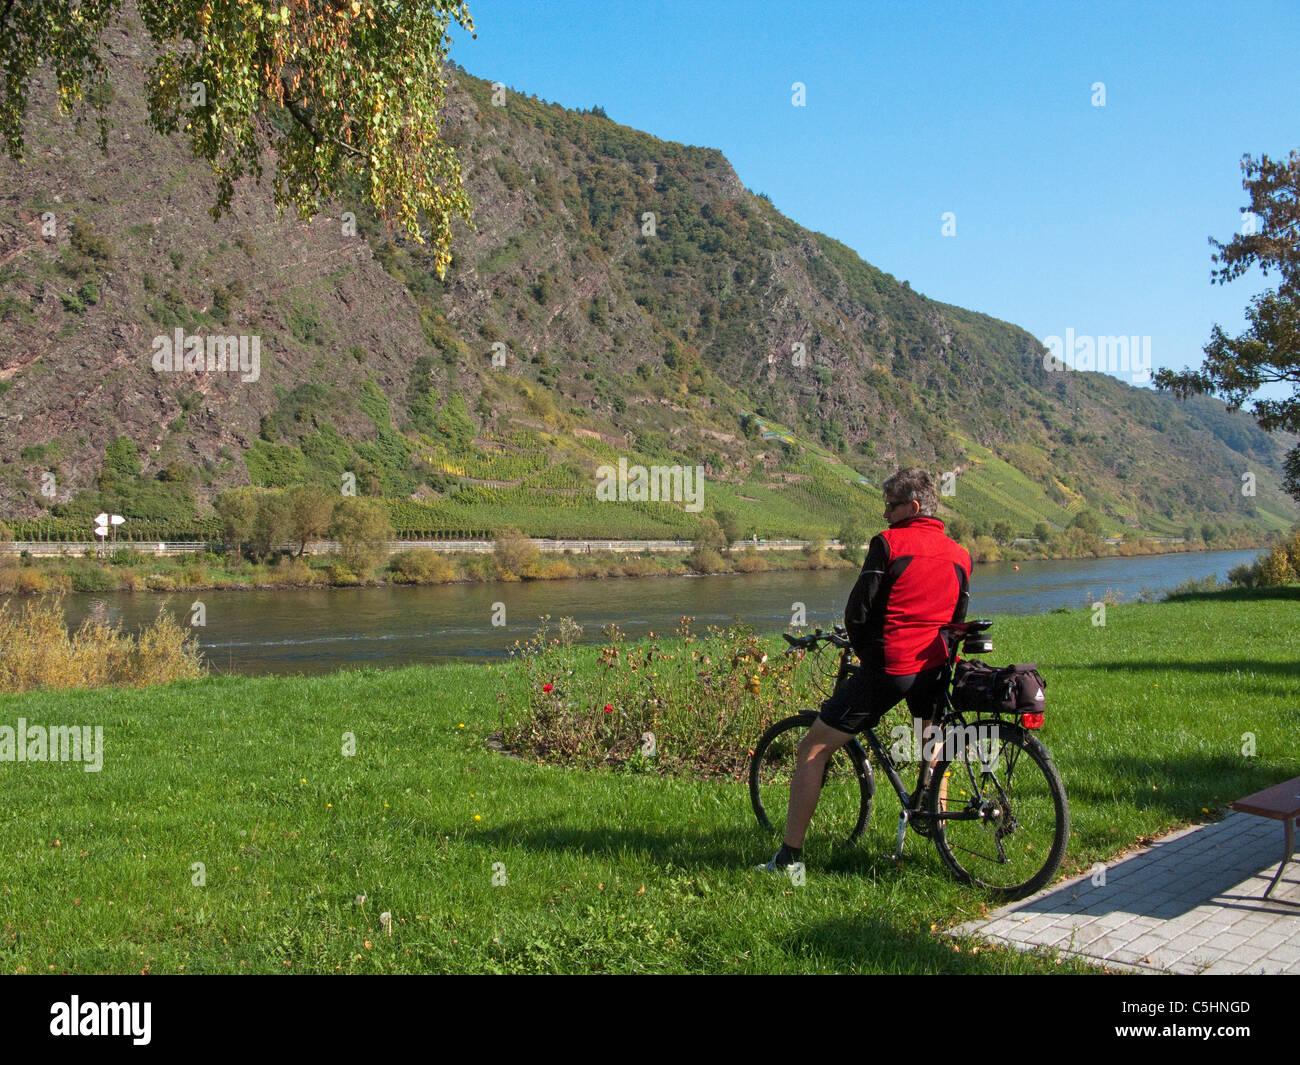 Radfahrer am Moselufer, Cochem, Biker at the riverside, Moselle - Stock Image